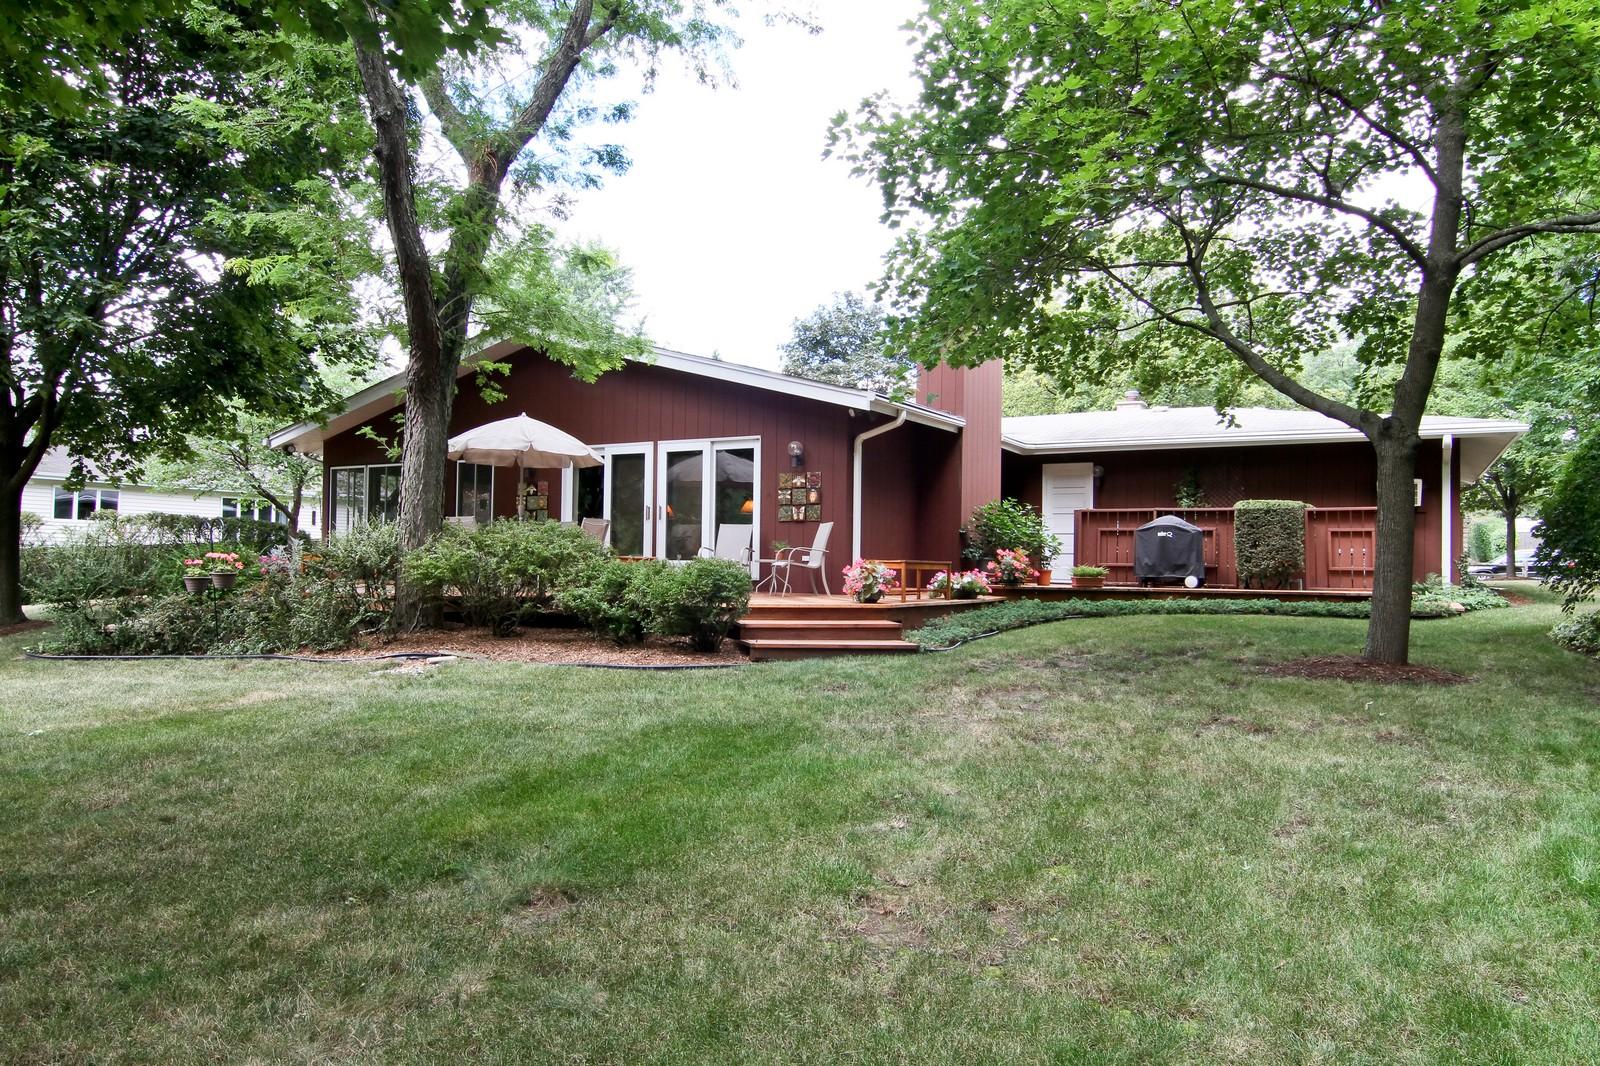 Real Estate Photography - 6801 Leonard Dr, Darien, IL, 60561 - View